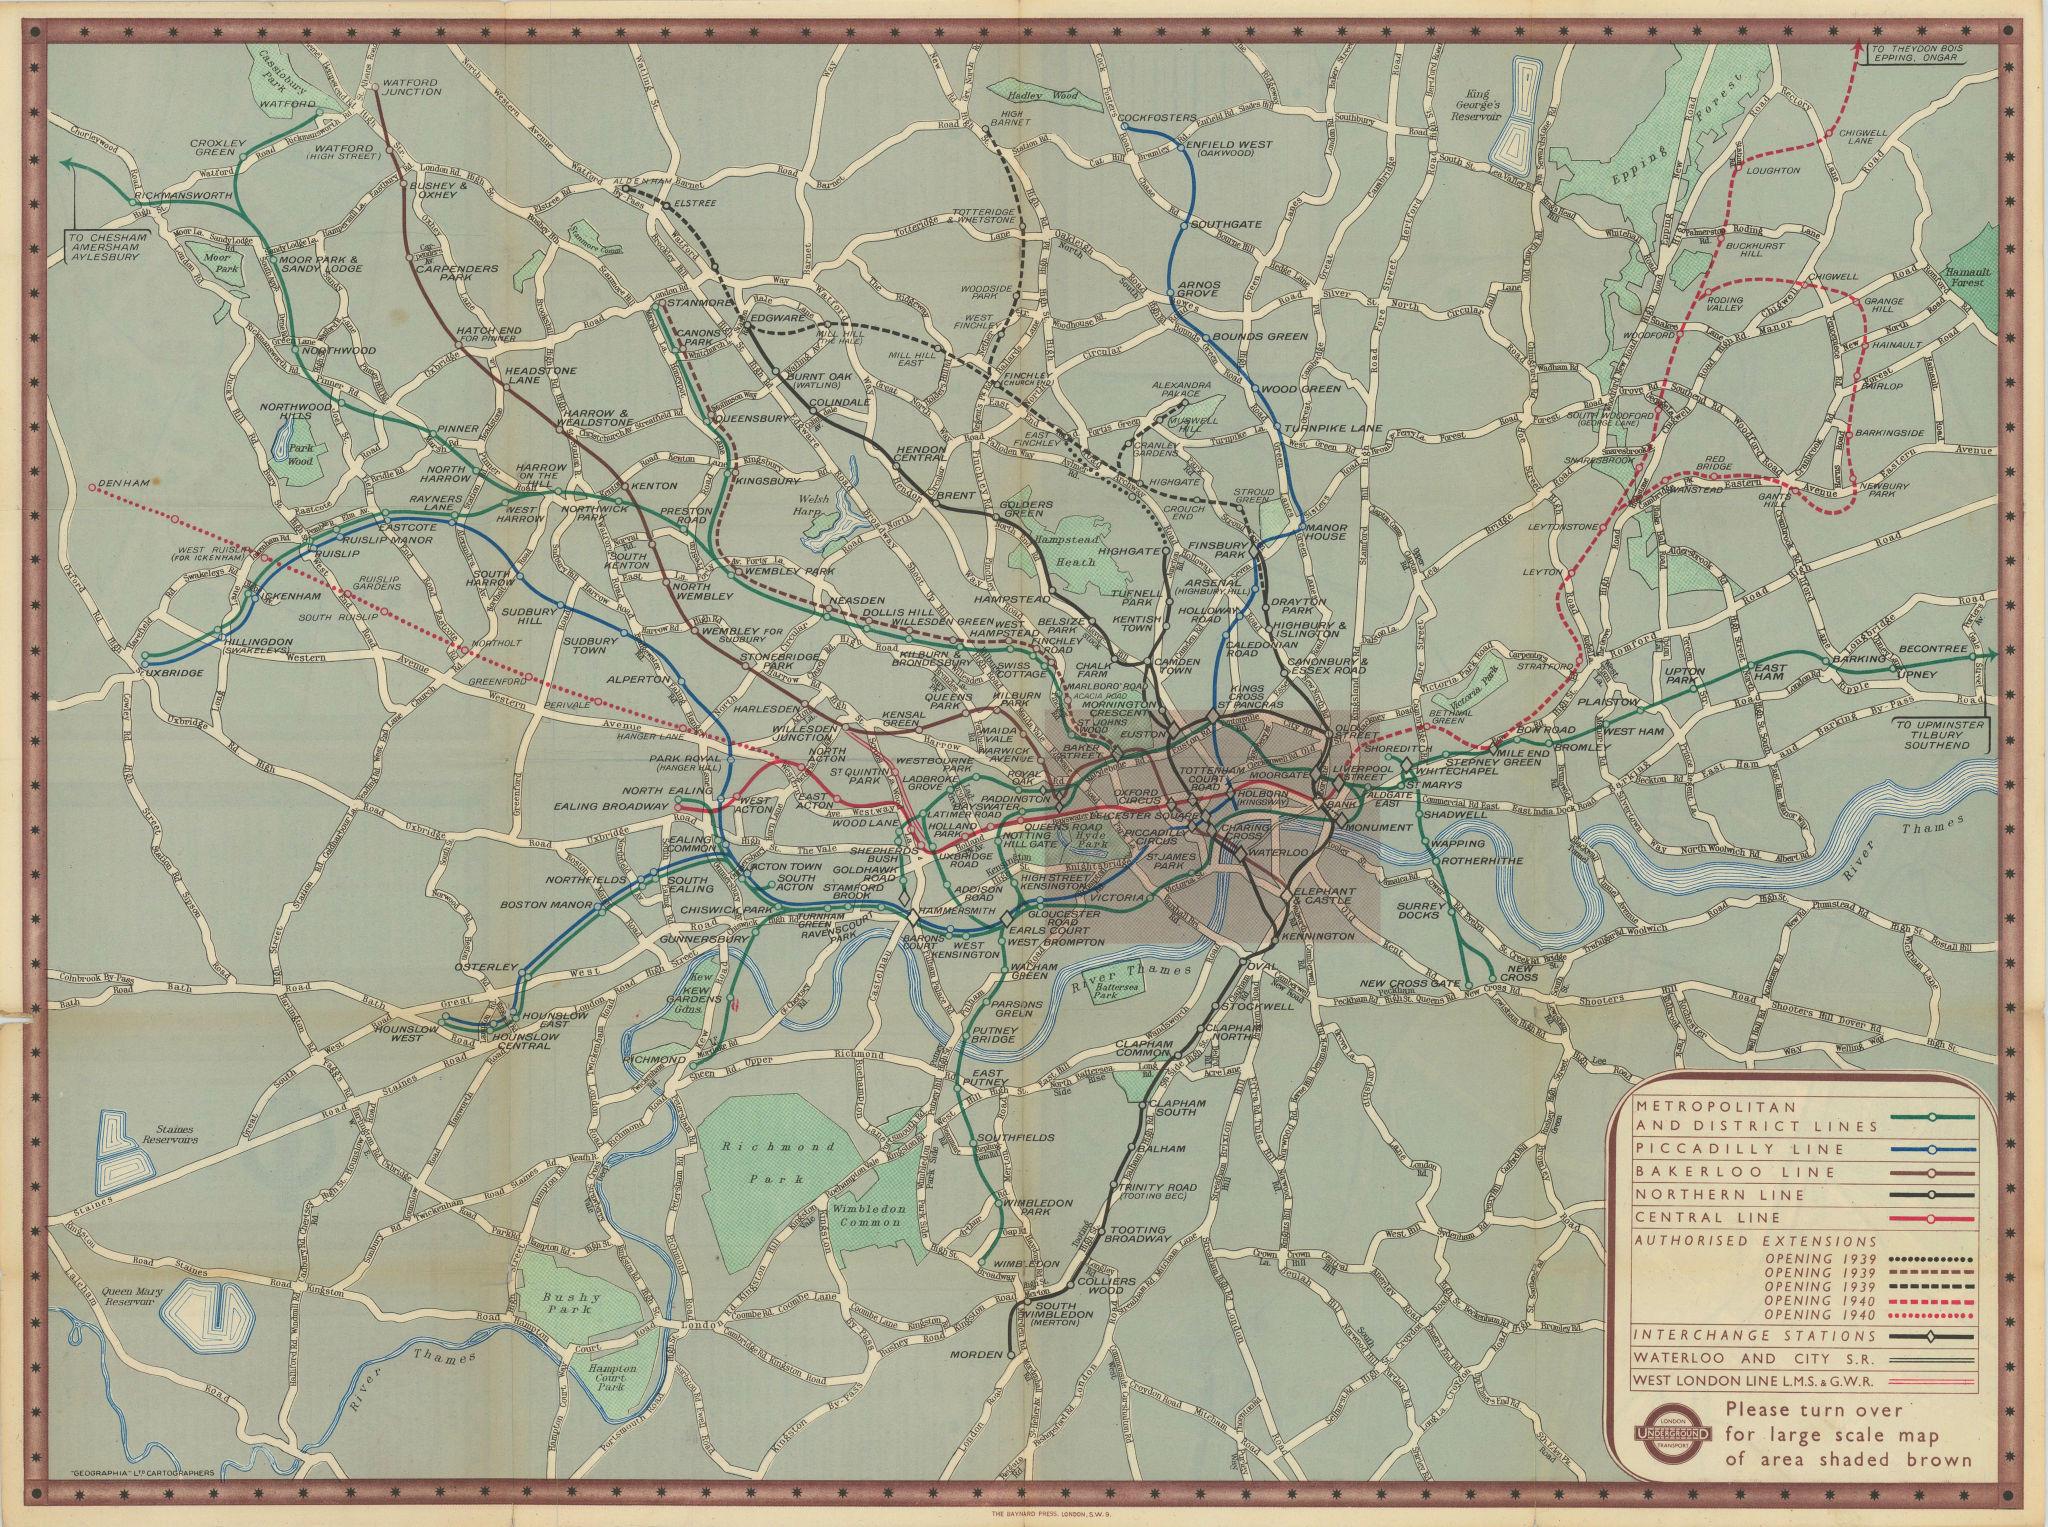 London Transport Underground Railway map #1 1938 old vintage plan chart